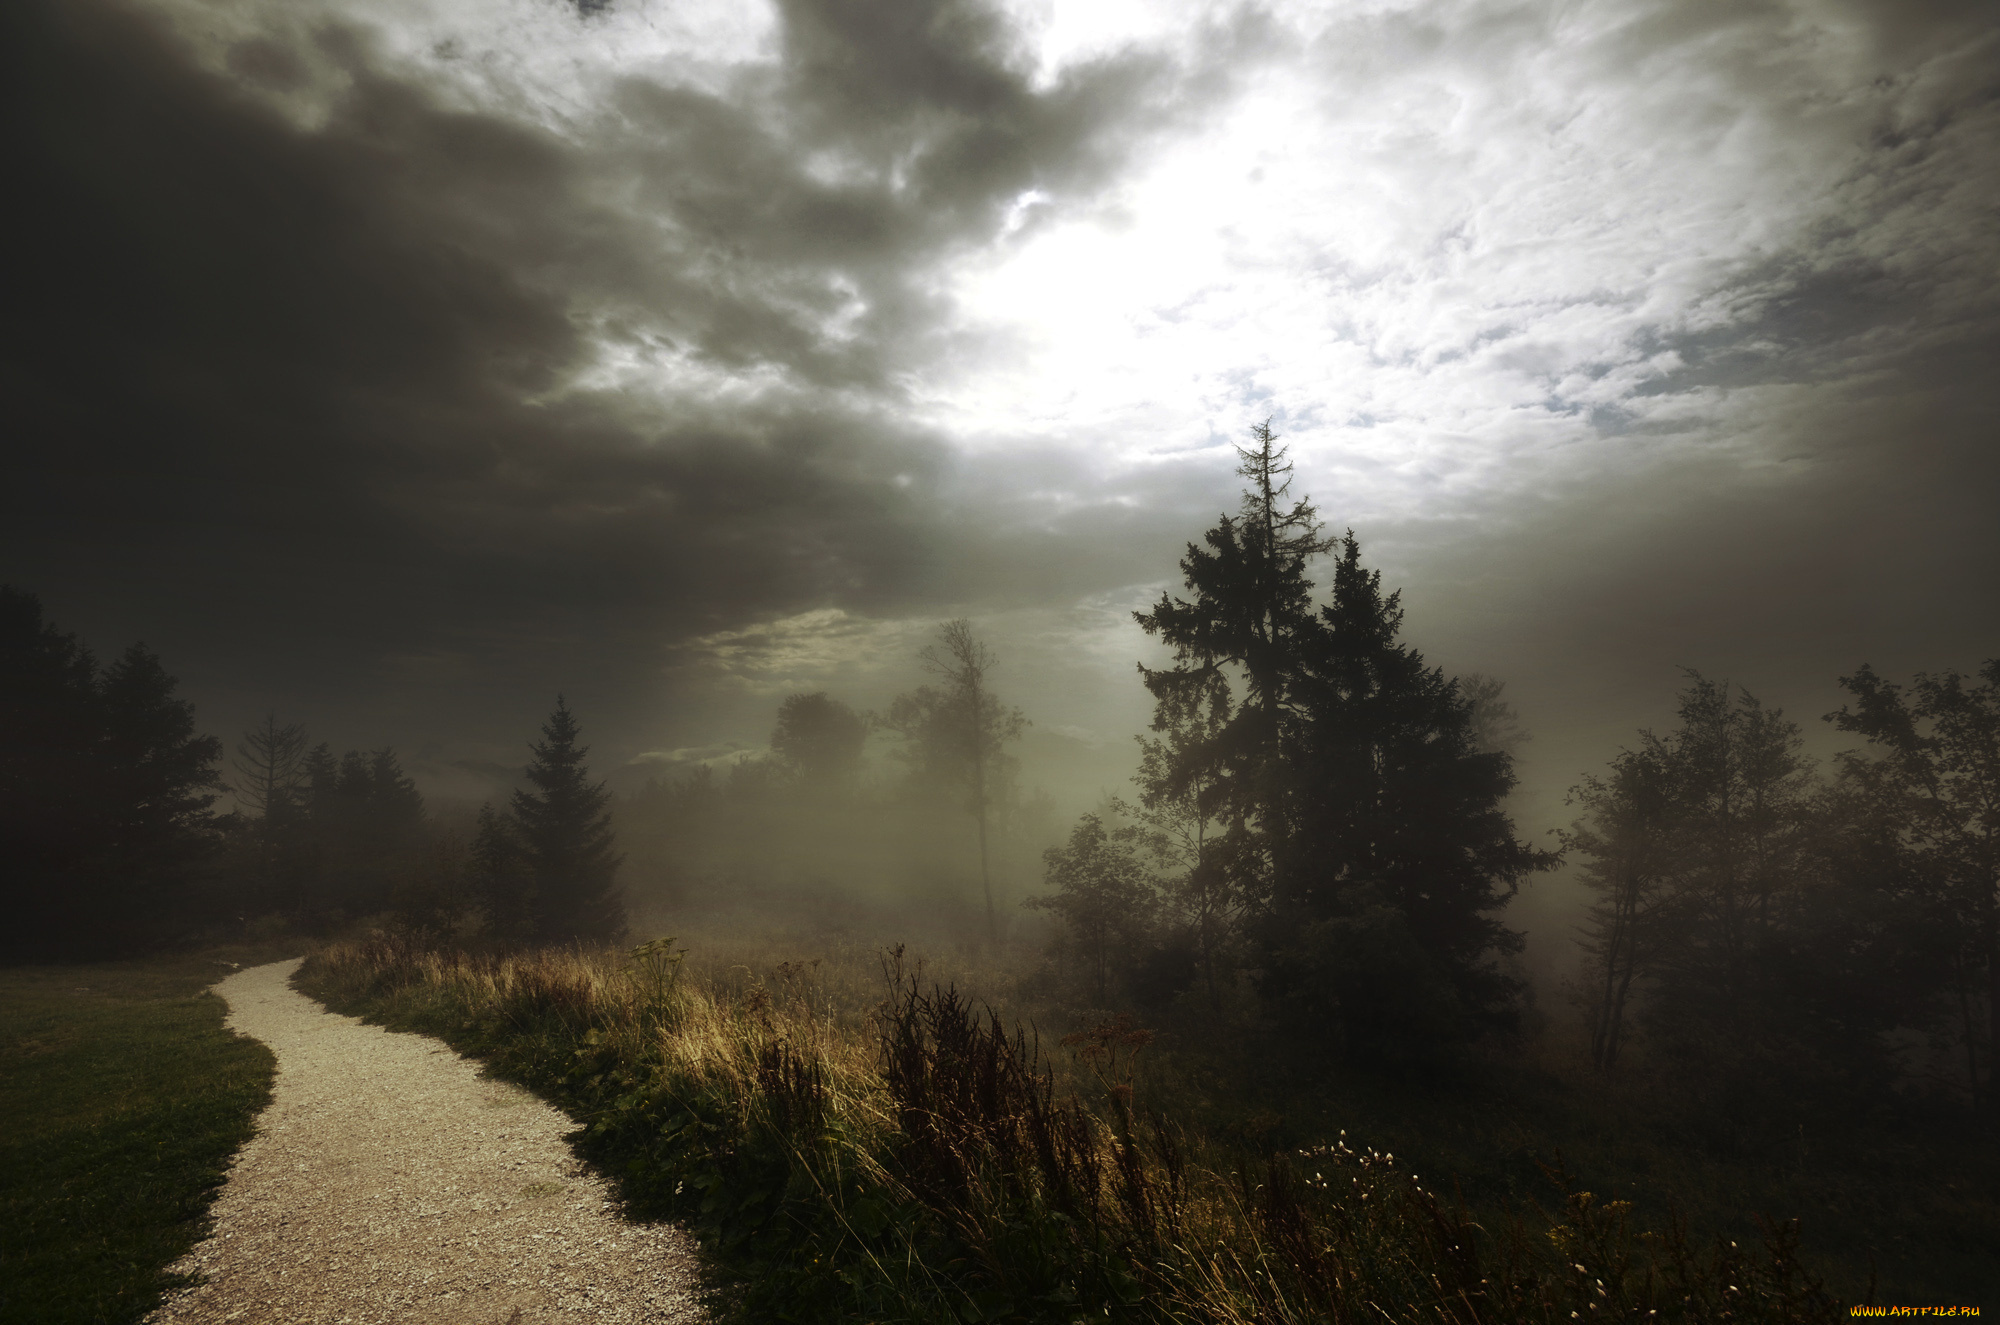 дорога гора тучи мрак бесплатно